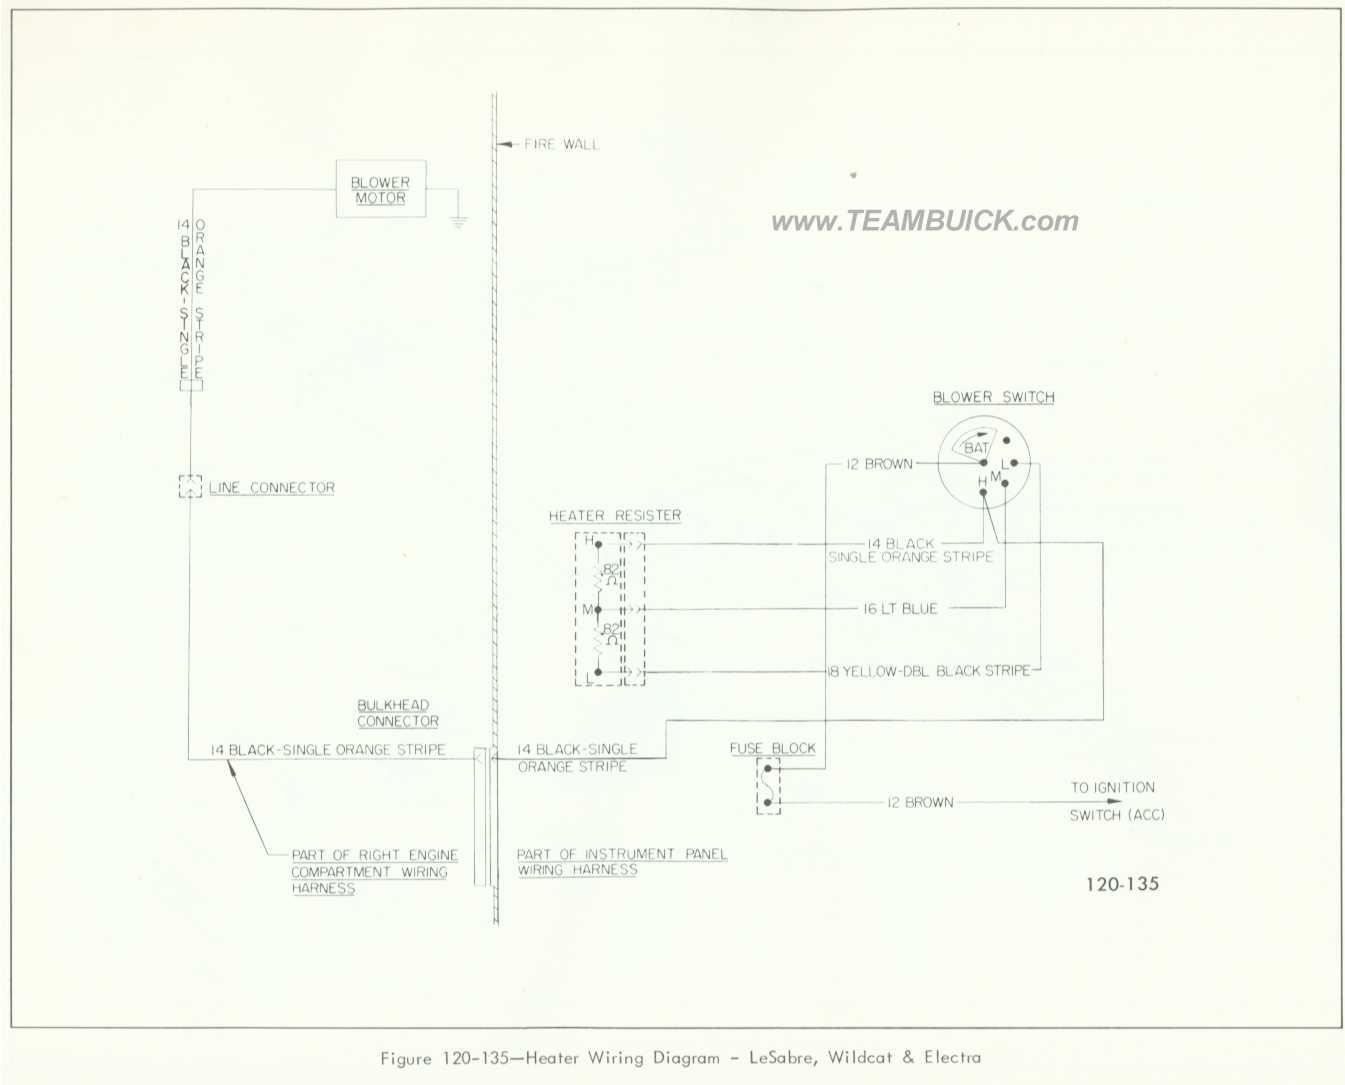 Buick Lesabre Wildcat Electra Heater Wiring Diagram